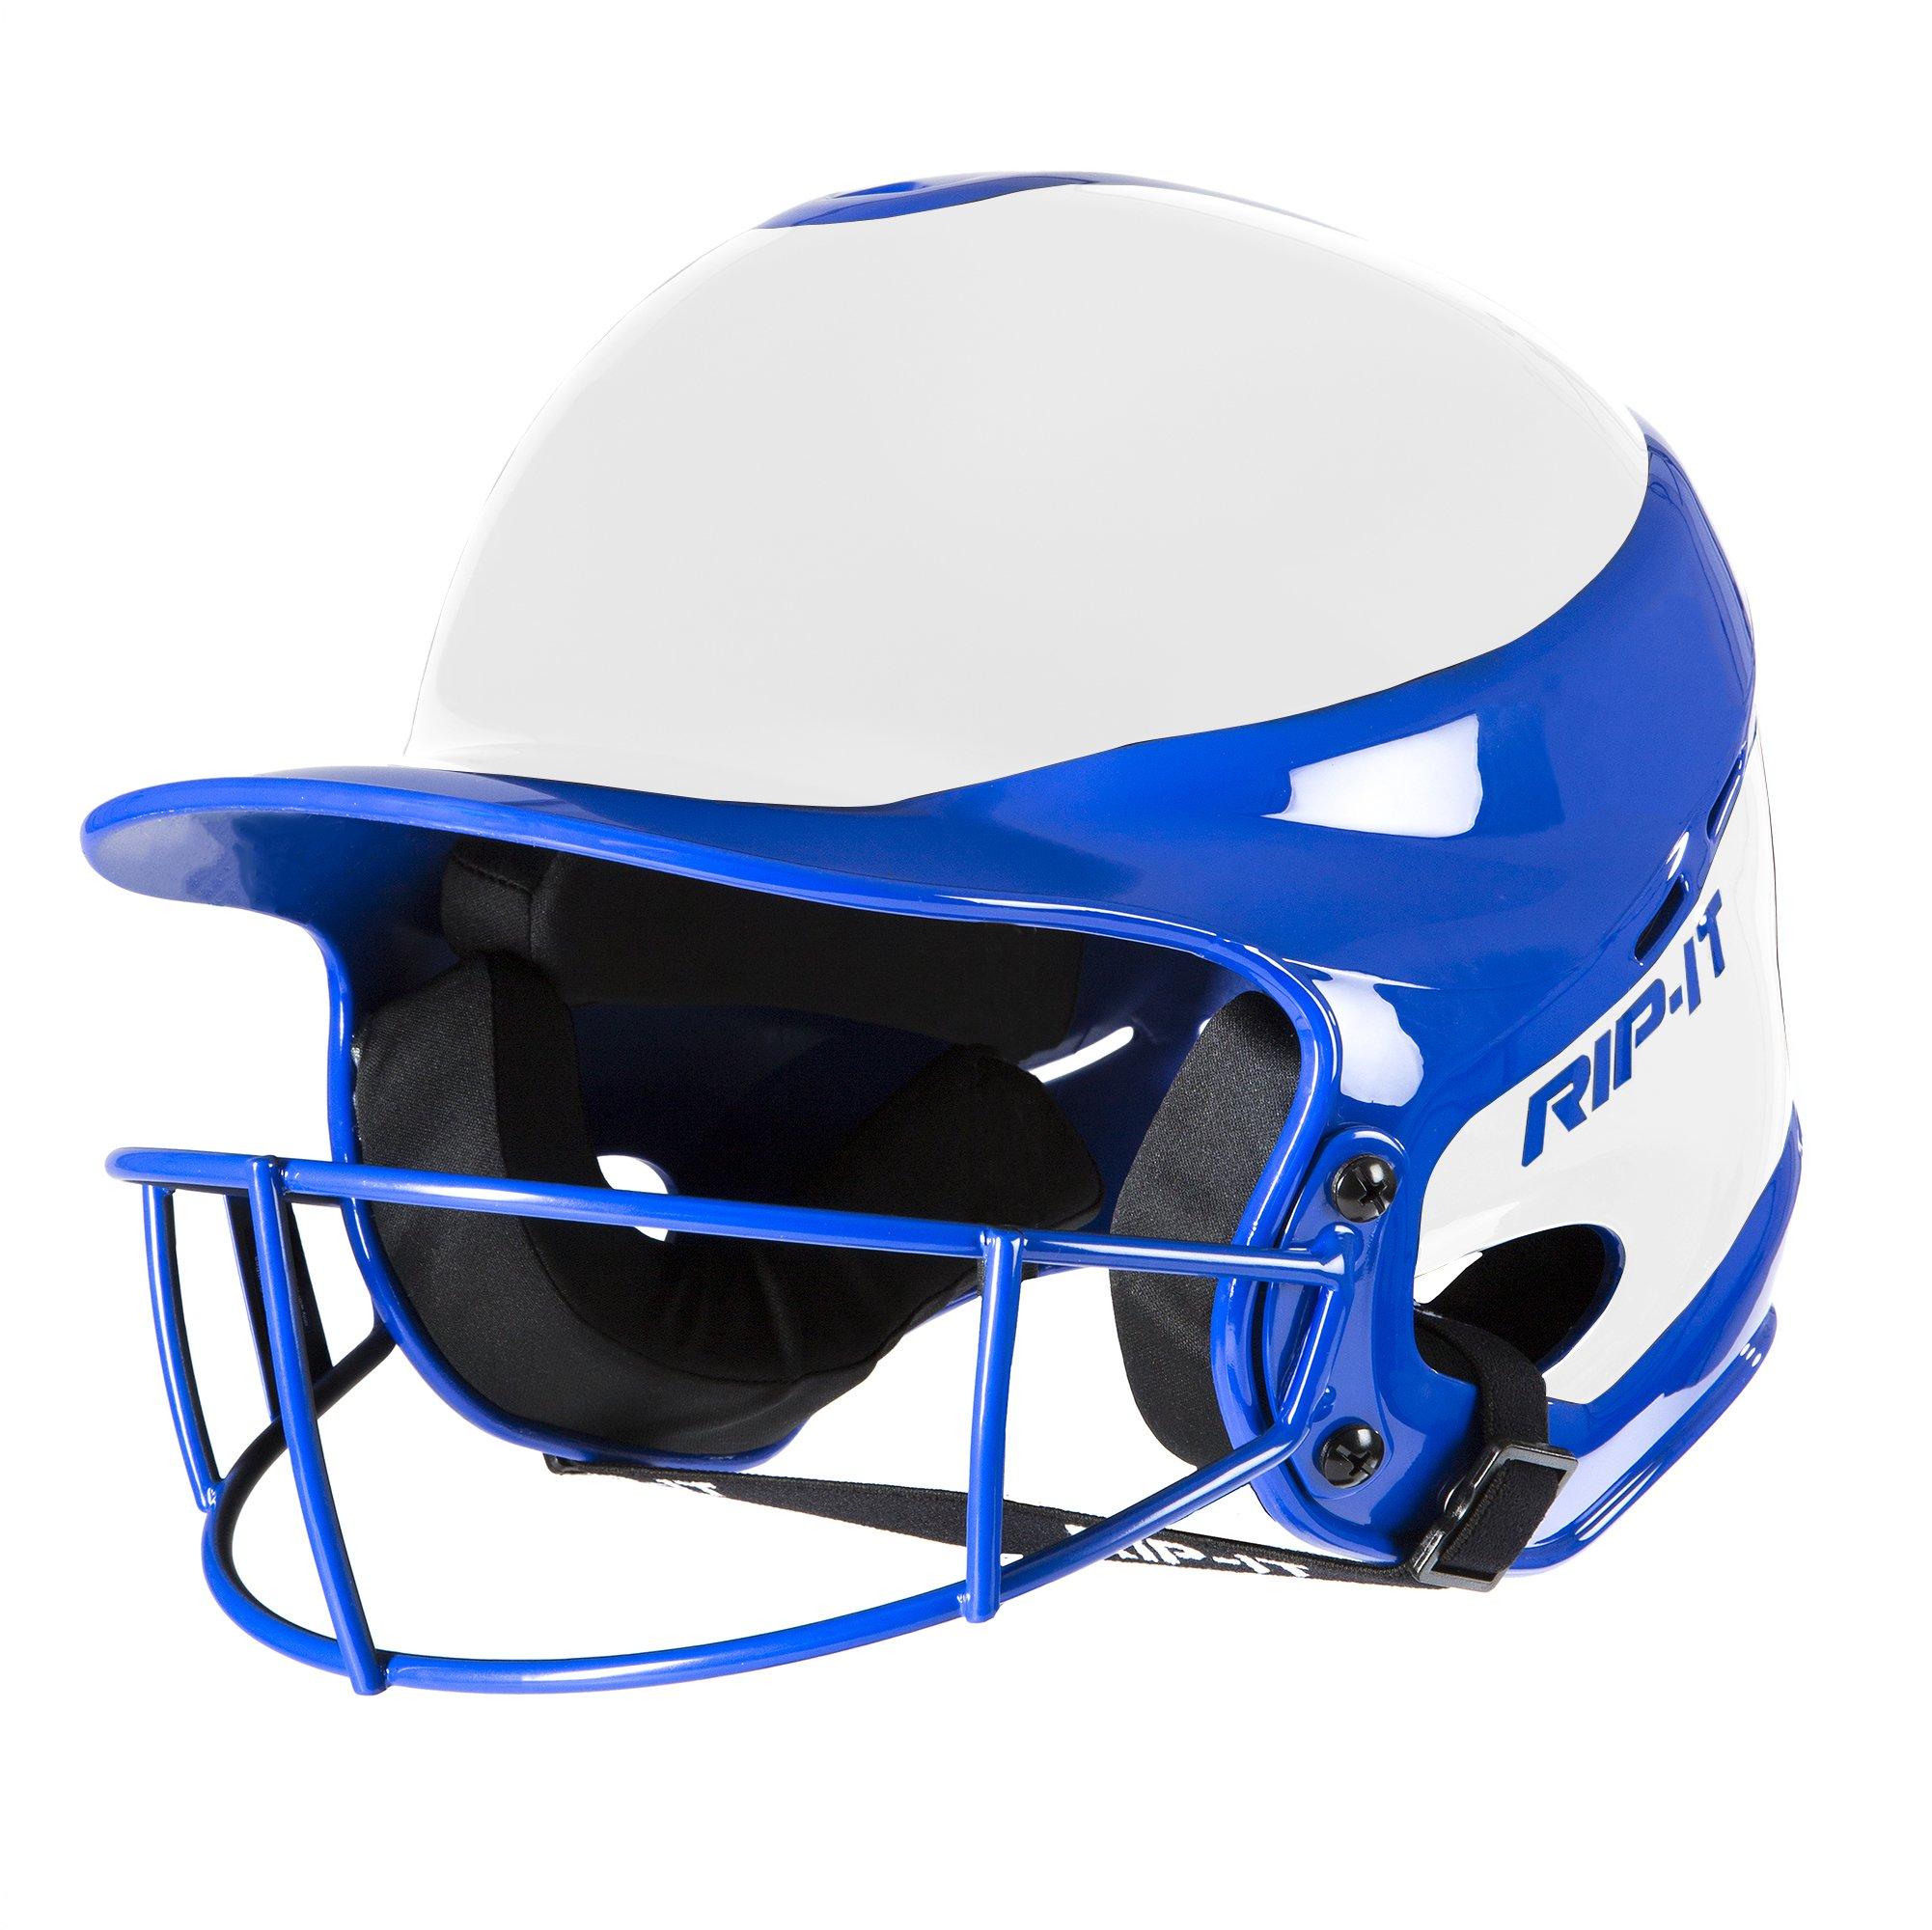 RIP-IT Vision Pro Away Softball Batting Helmet by RIP-IT